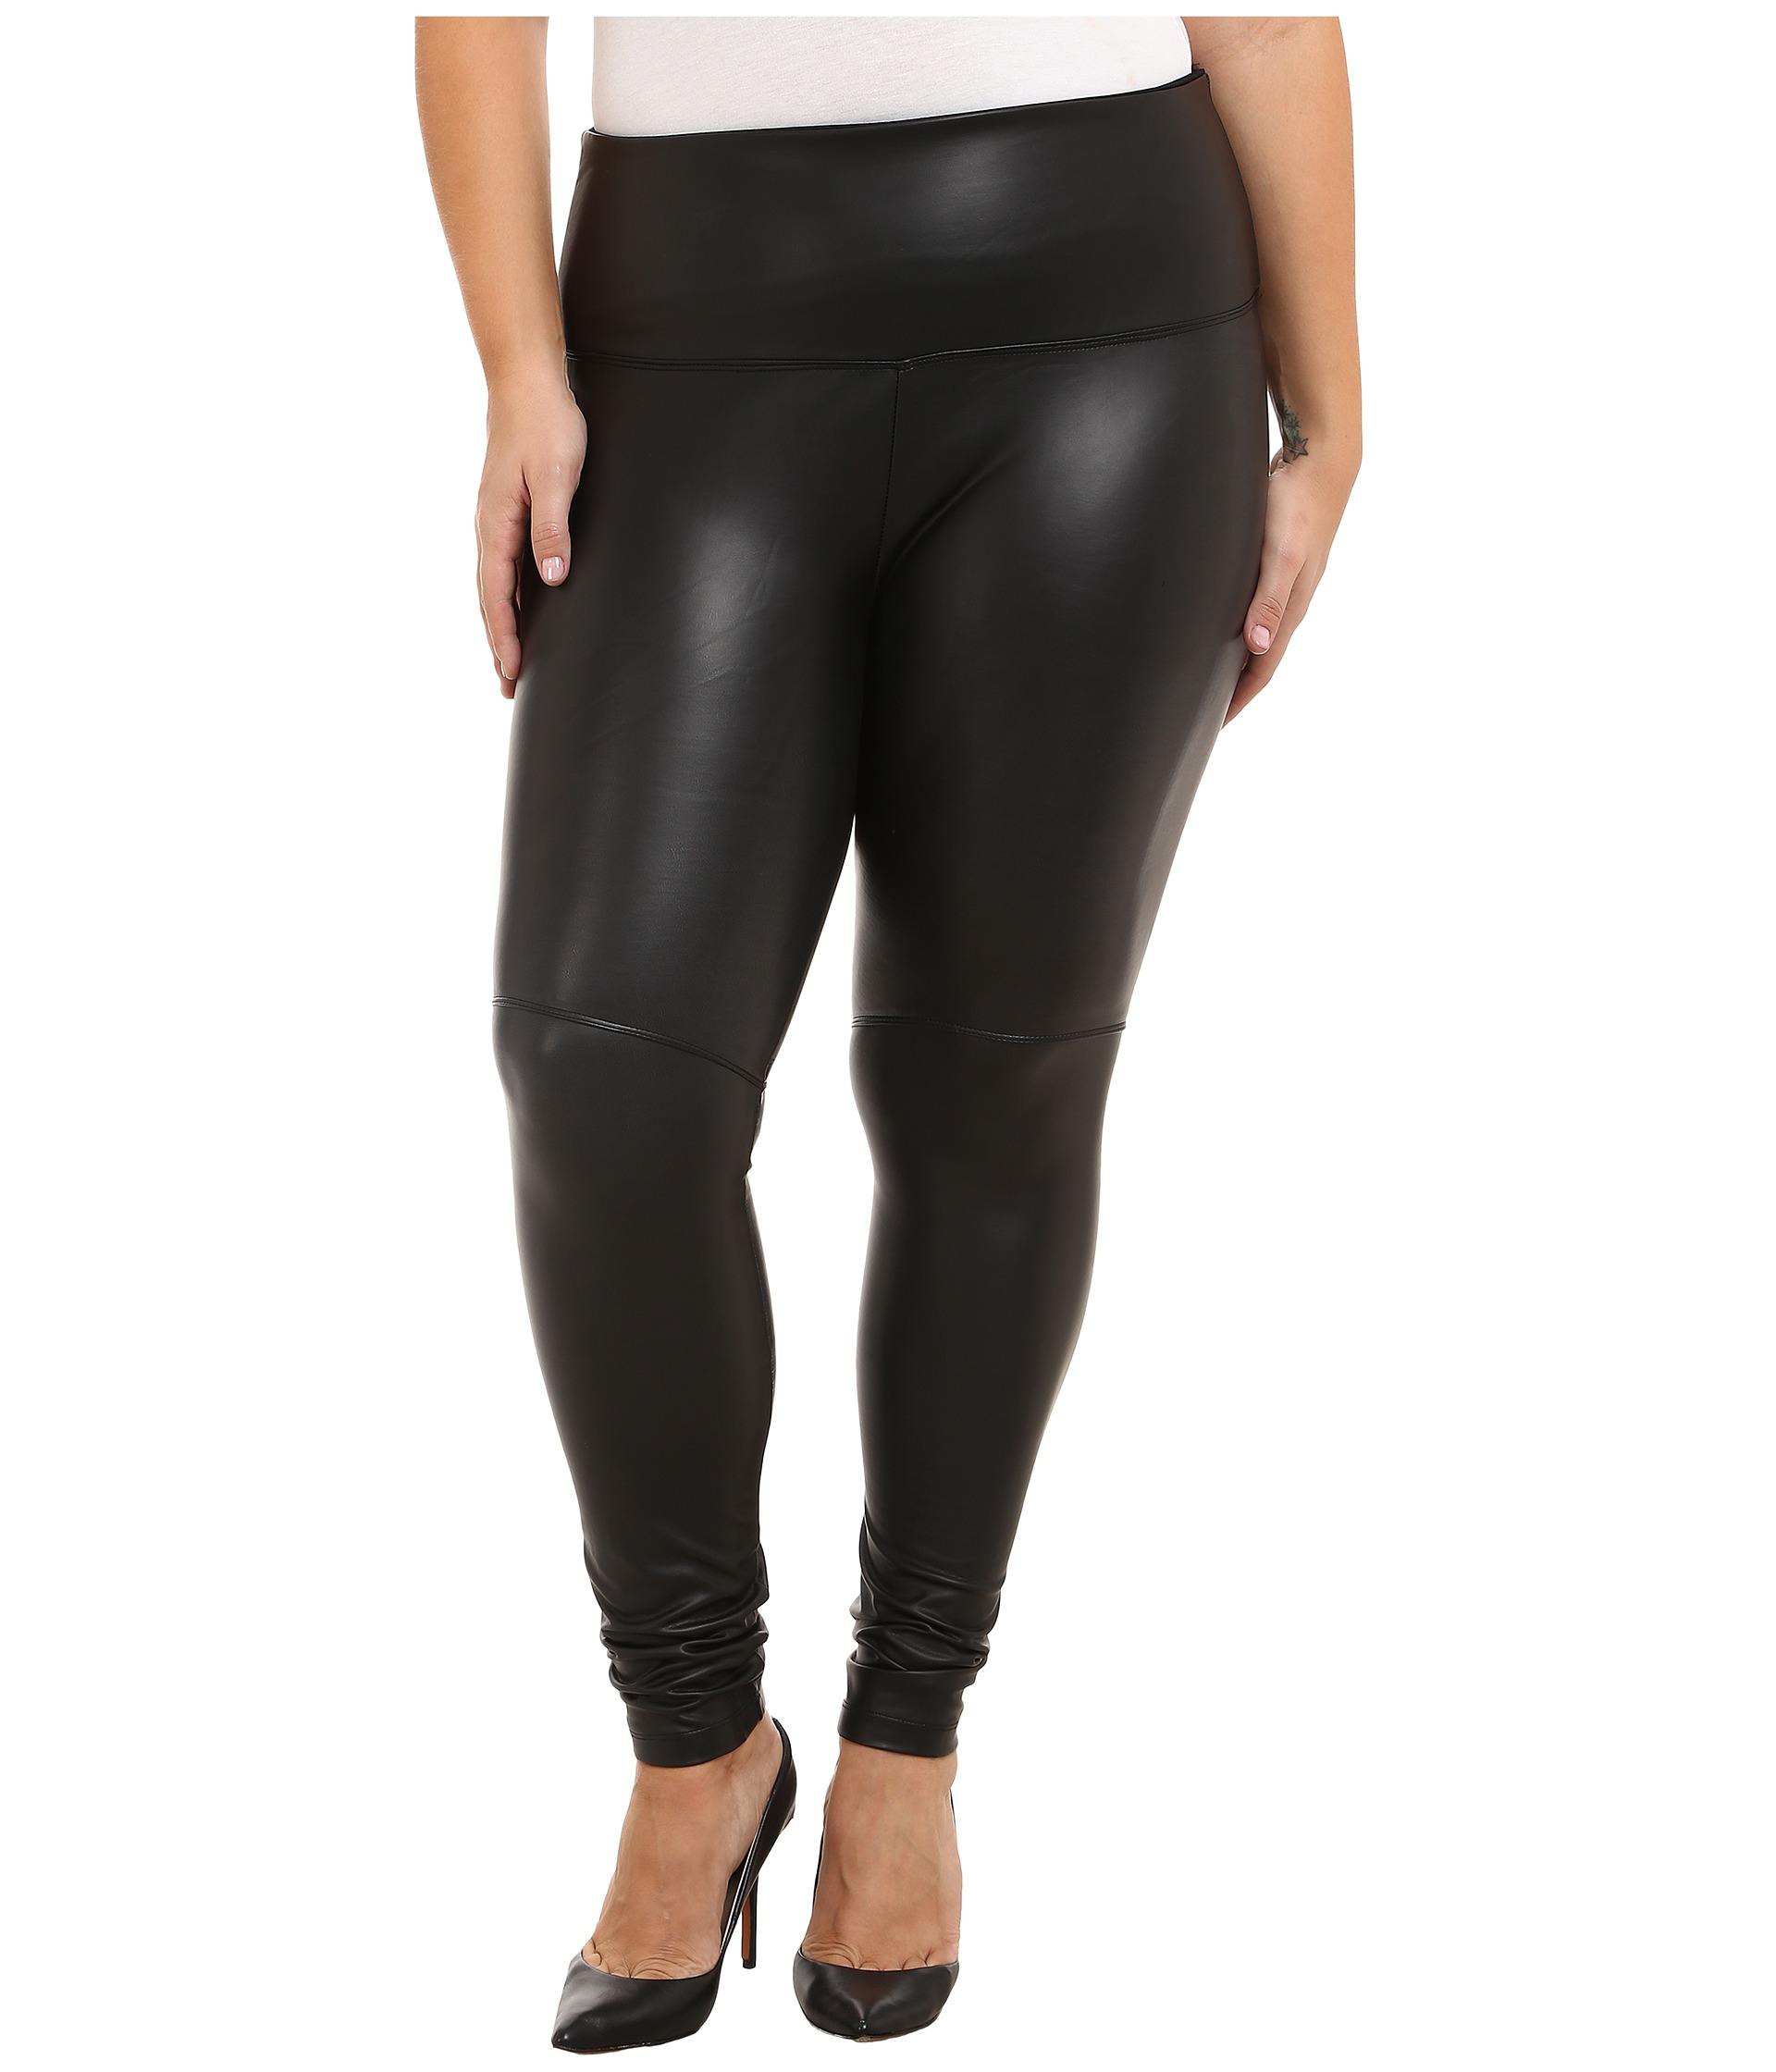 Lysse Vegan Leather Legging, Clothing | Shipped Free at Zappos